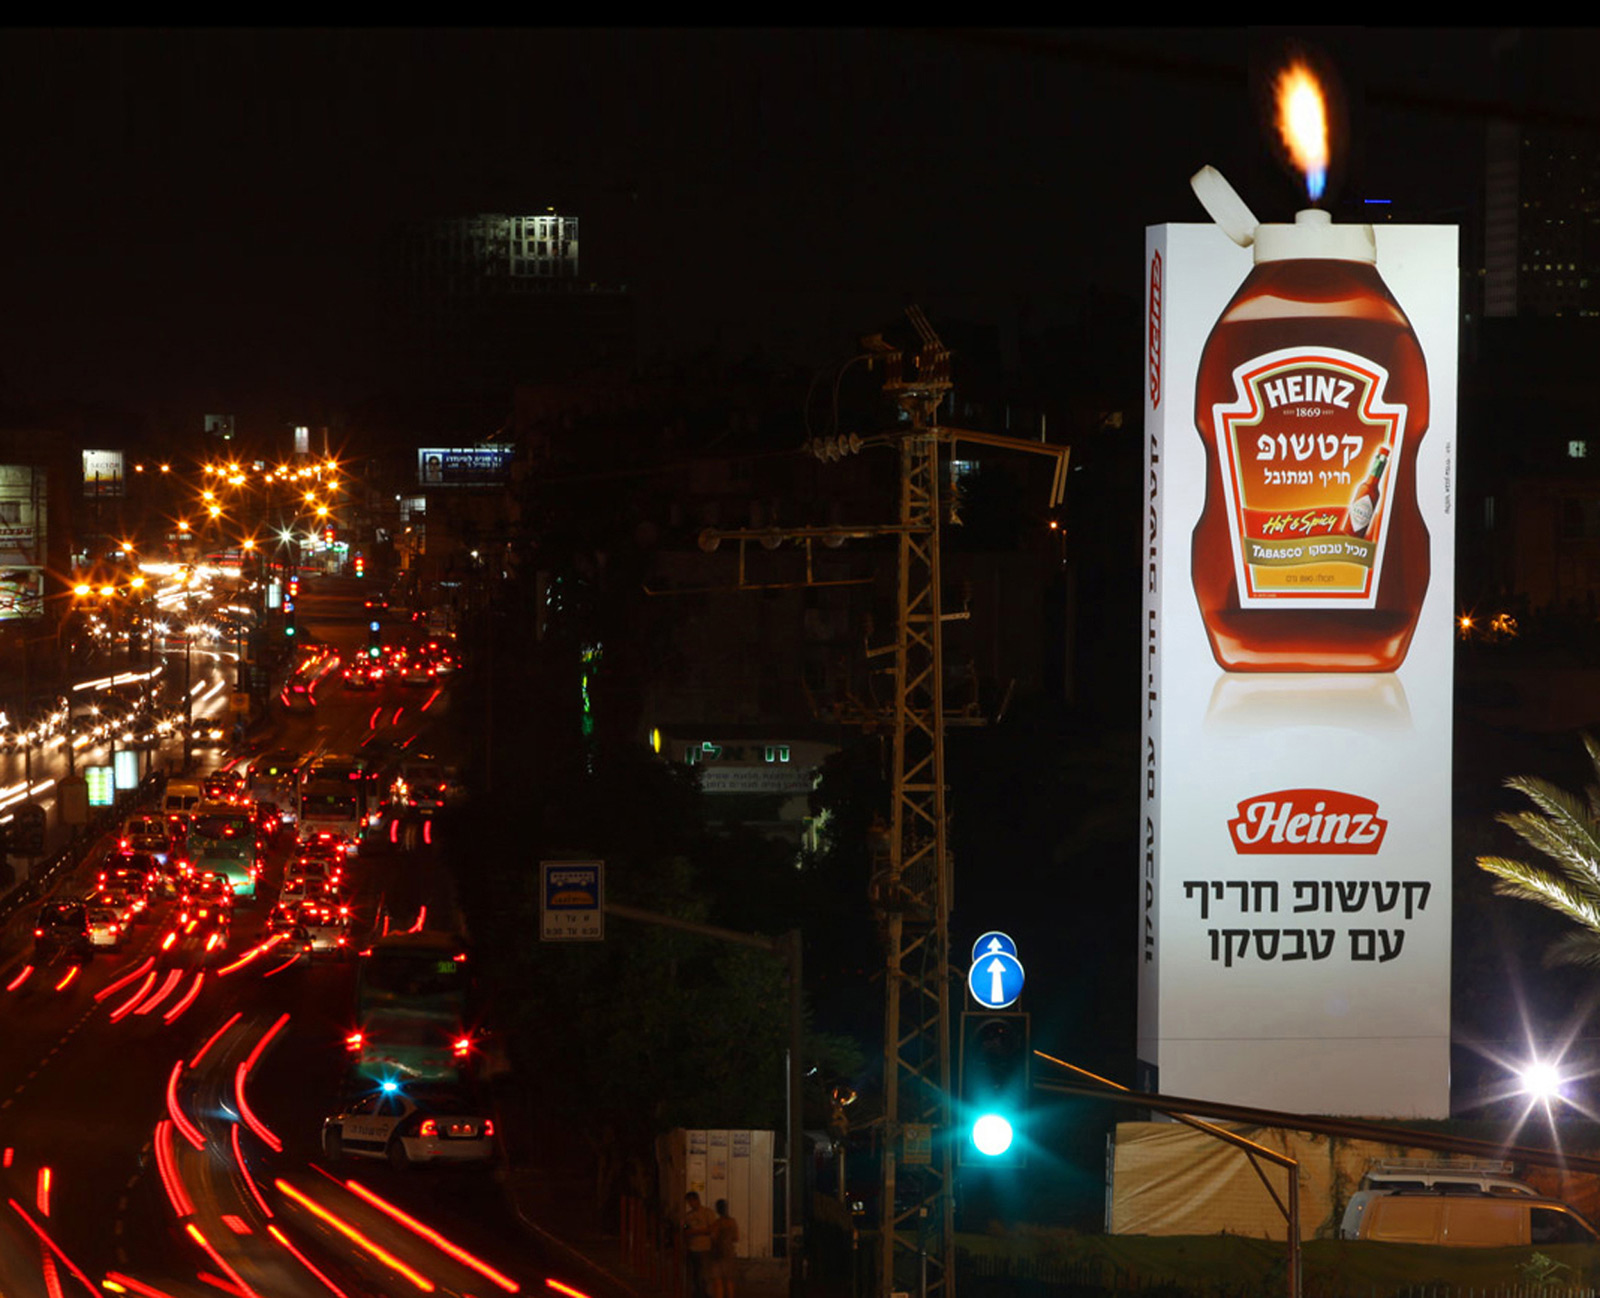 heinzfire Heinz зажигает в Тель Авиве